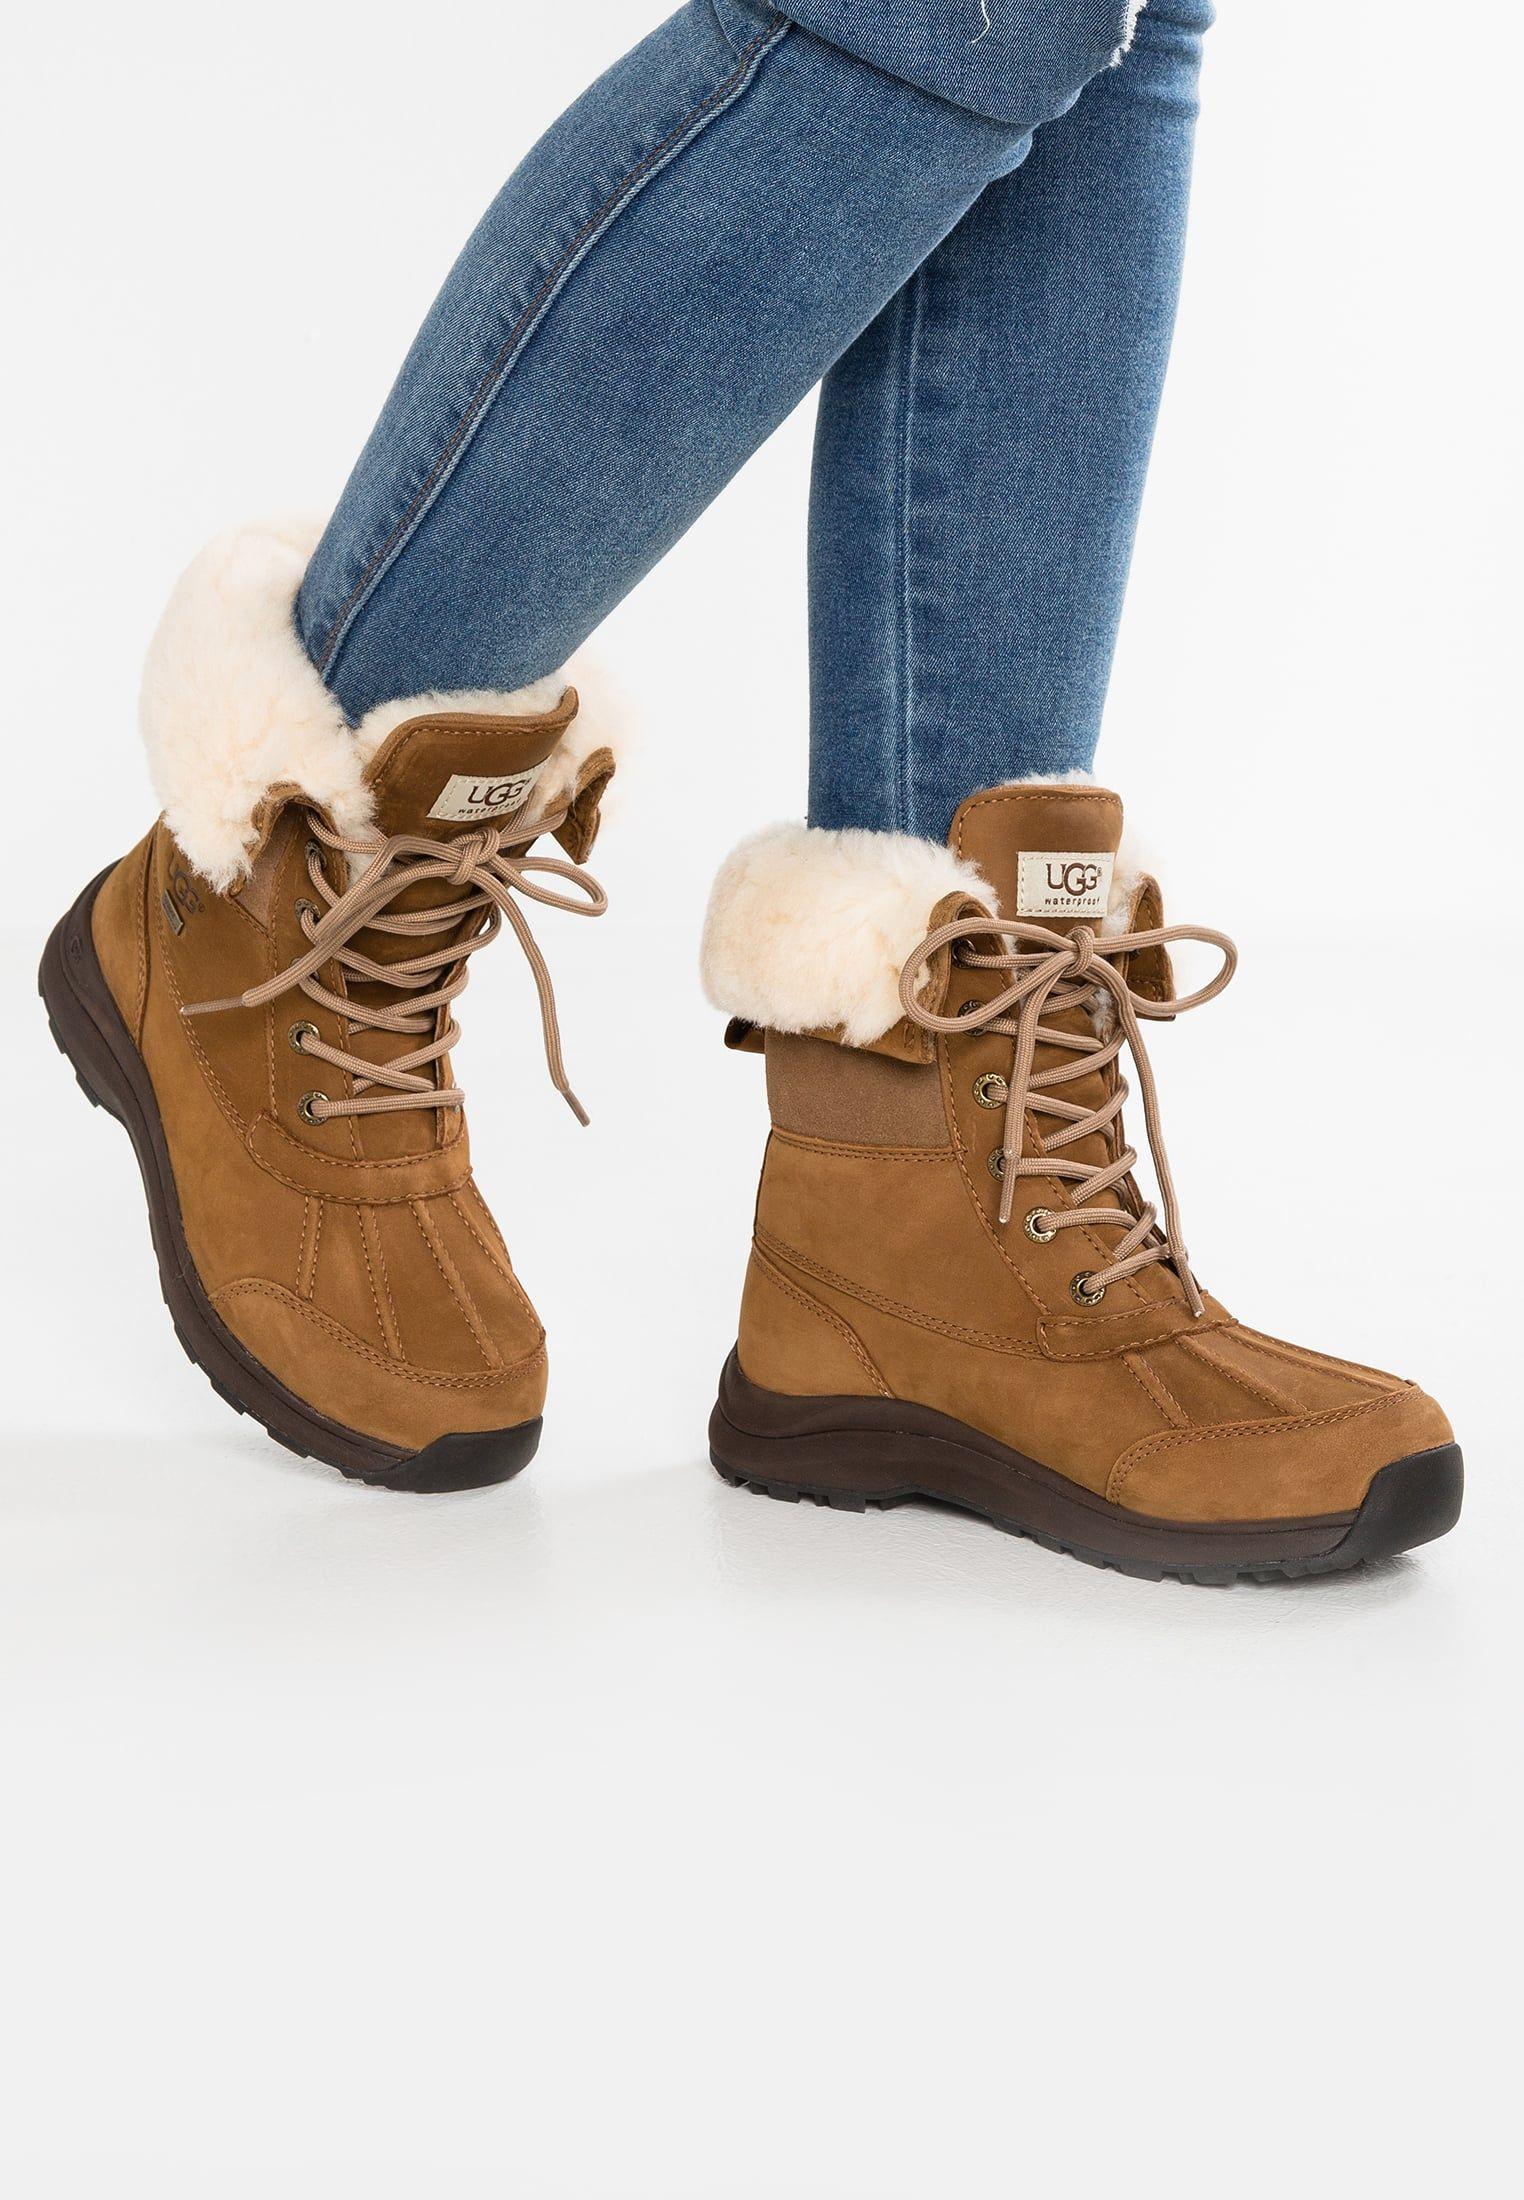 UGG ADIRONDACK III - Lace-up boots - chestnut Jlatns0x